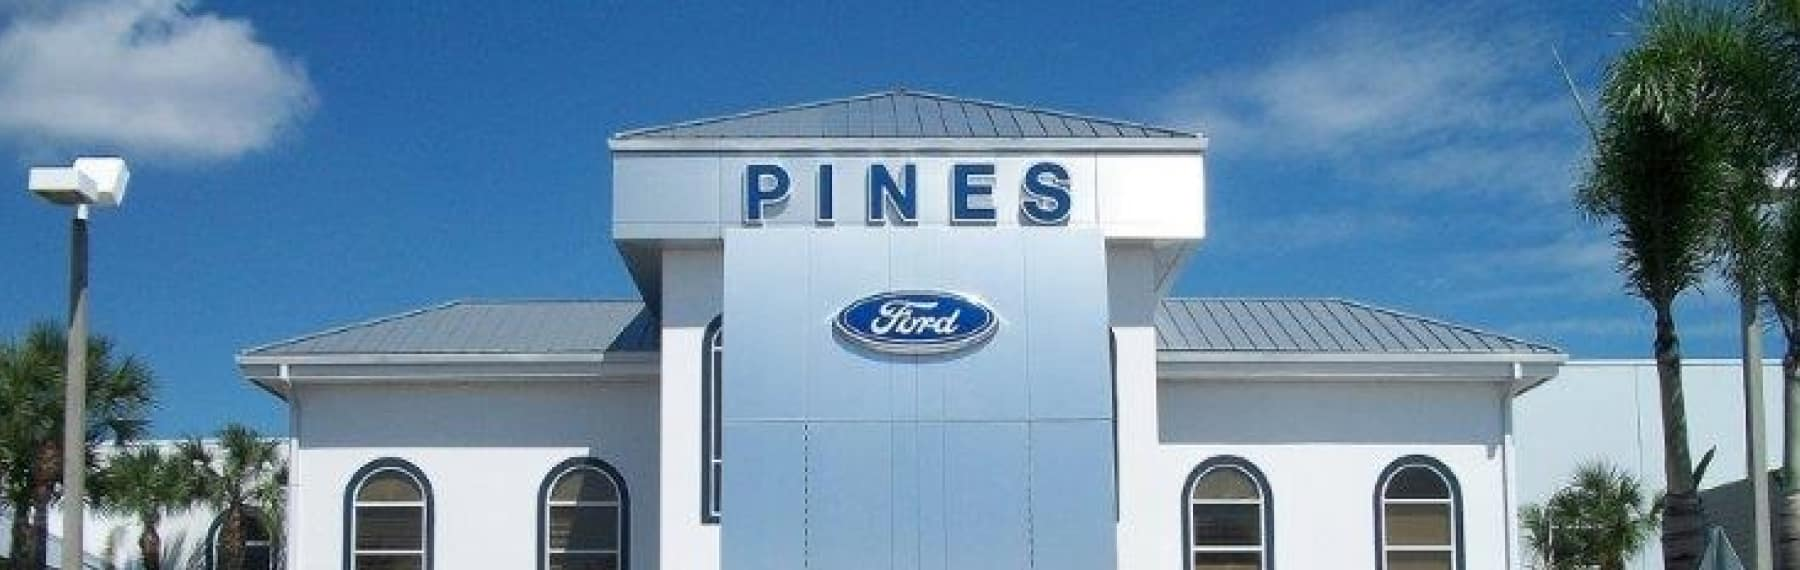 Pines Dealership